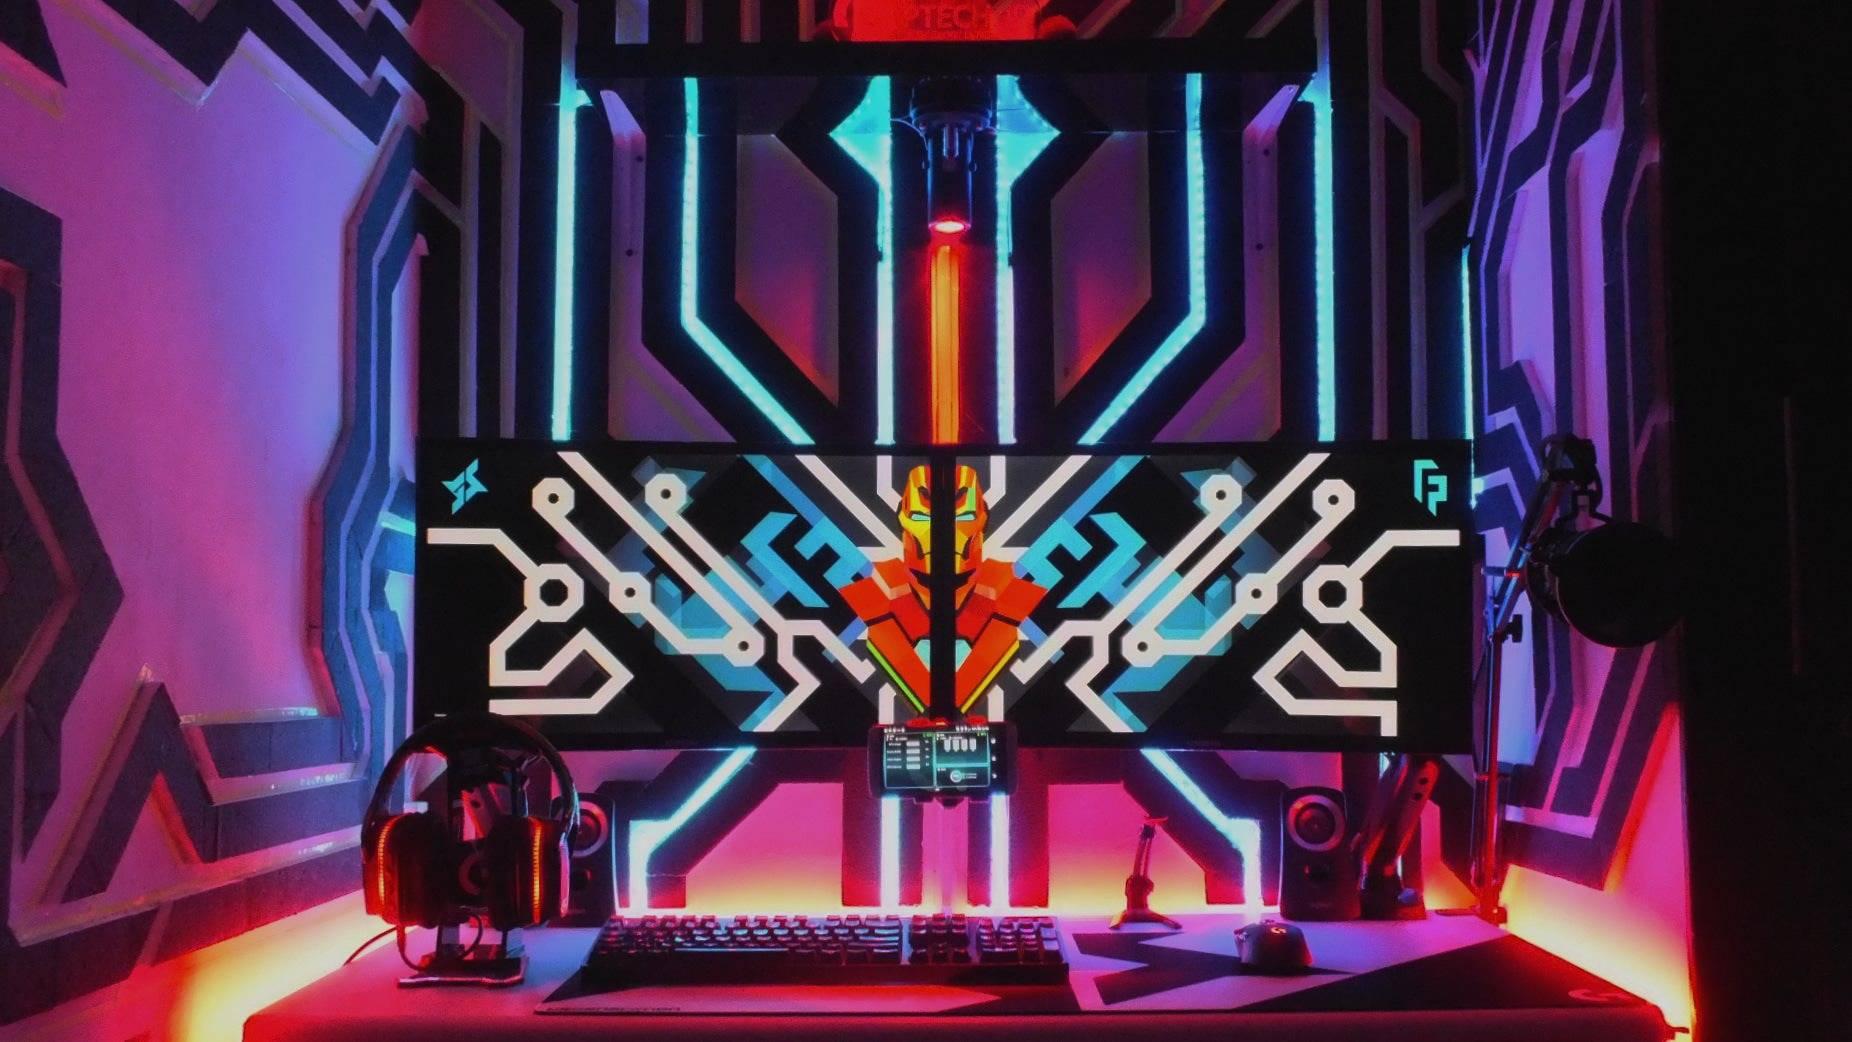 ysgeneration's Setup - Cyberjunk Styroglow | Scooget